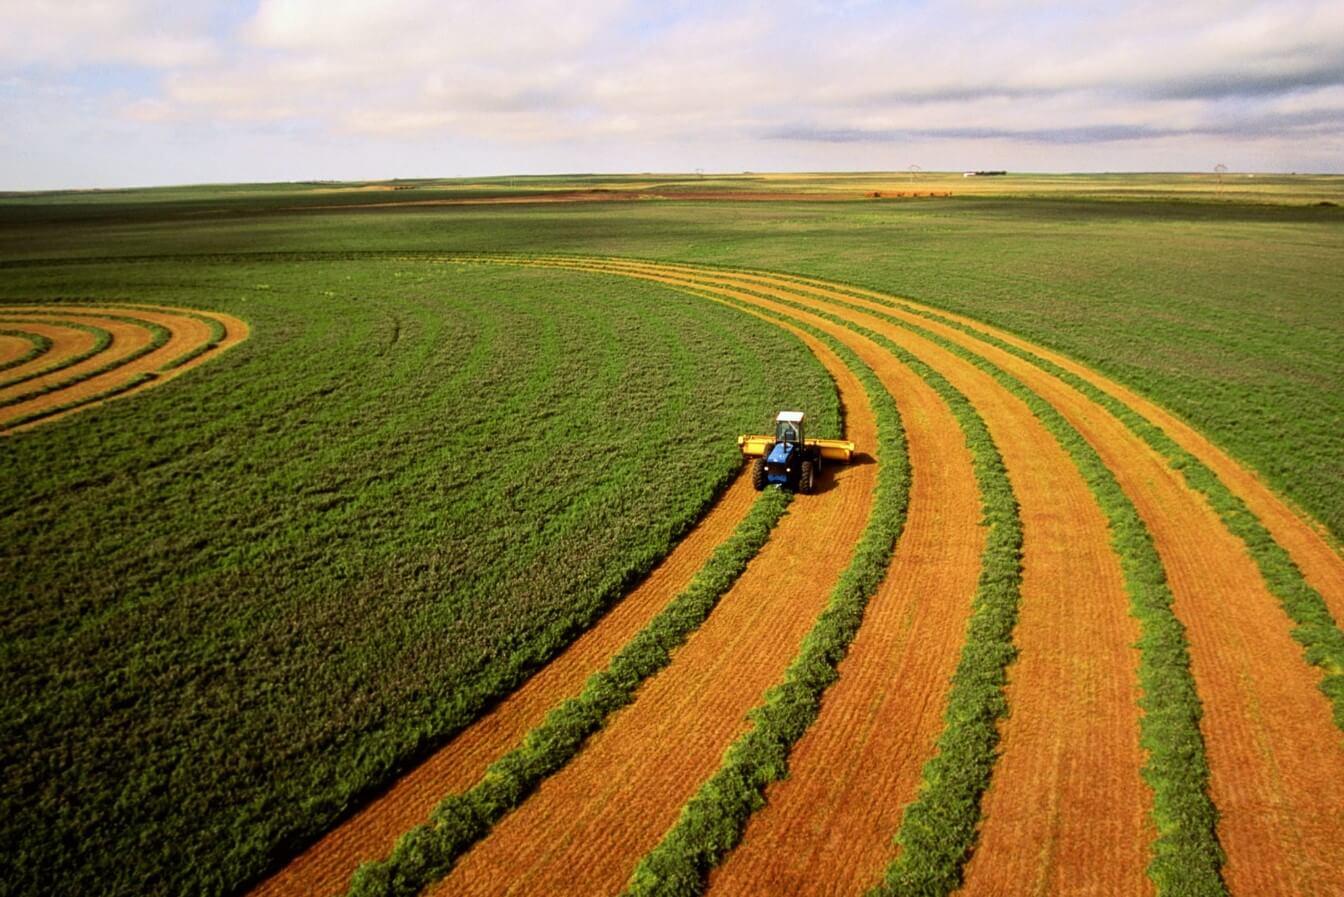 Ограничения на использование земли. Обмеження на використання землі